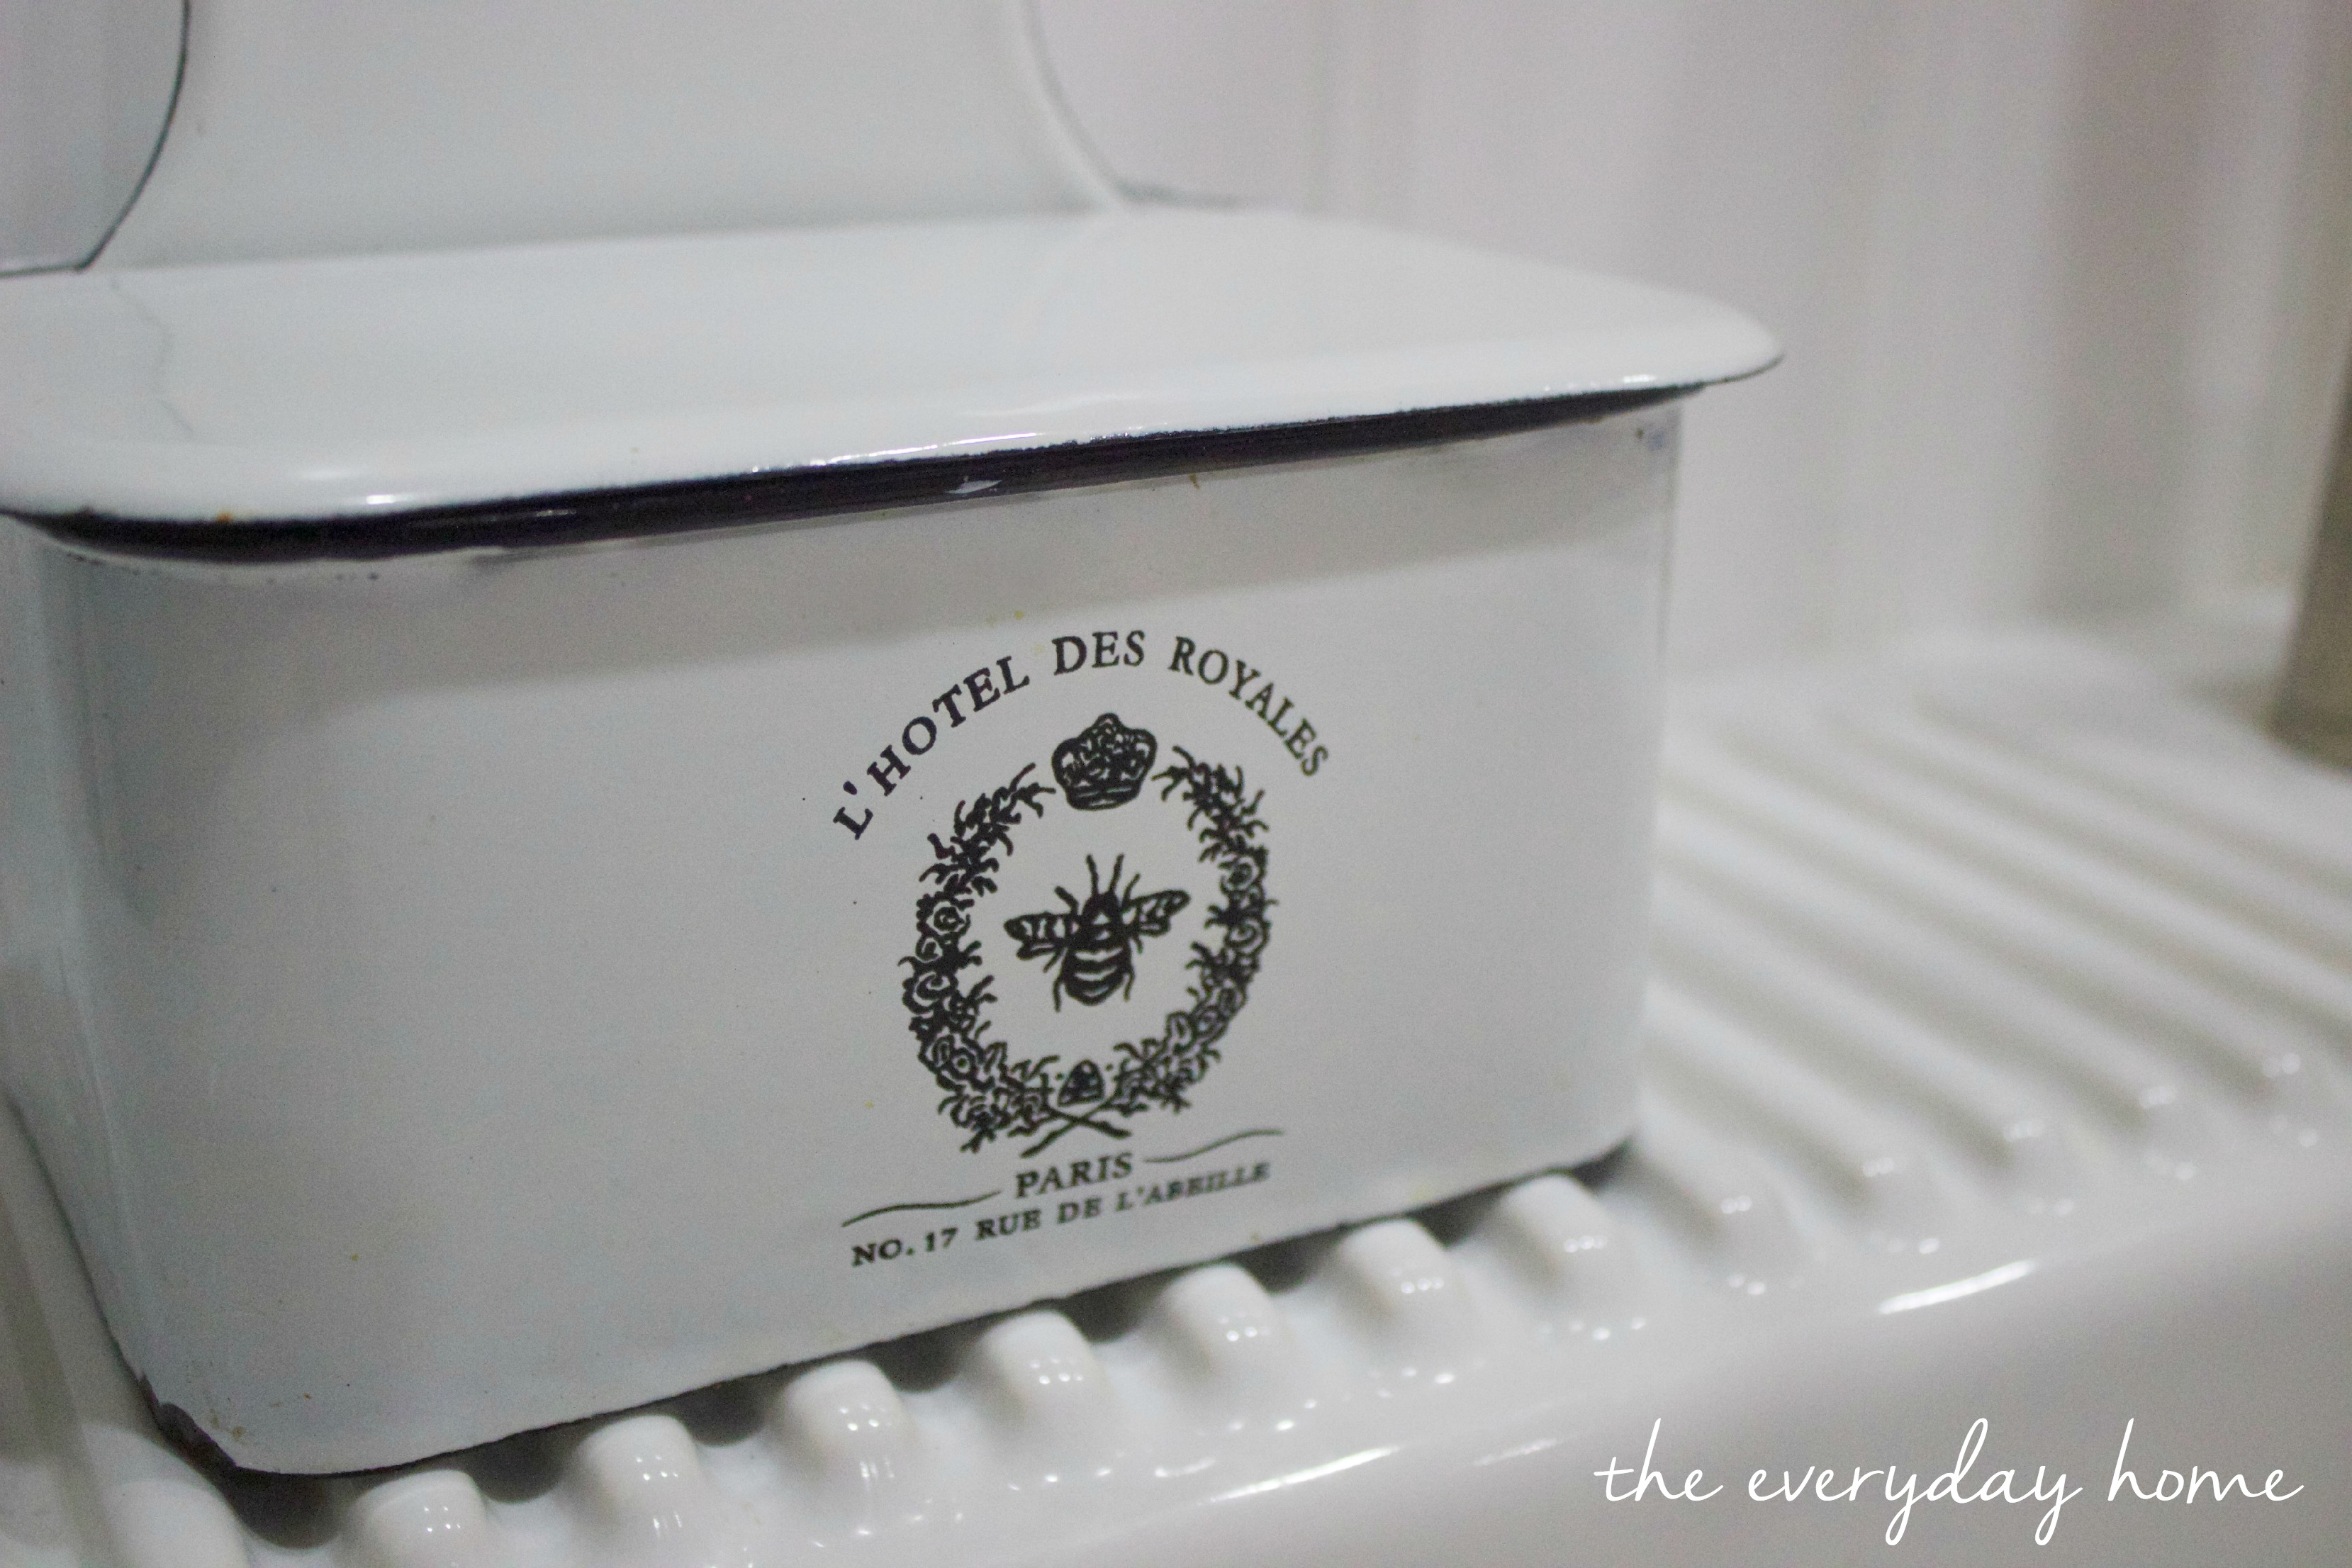 White apron front sink ikea - Ikea Farmhouse Sink The Everyday Home Www Evevrydayhomeblog Com 11